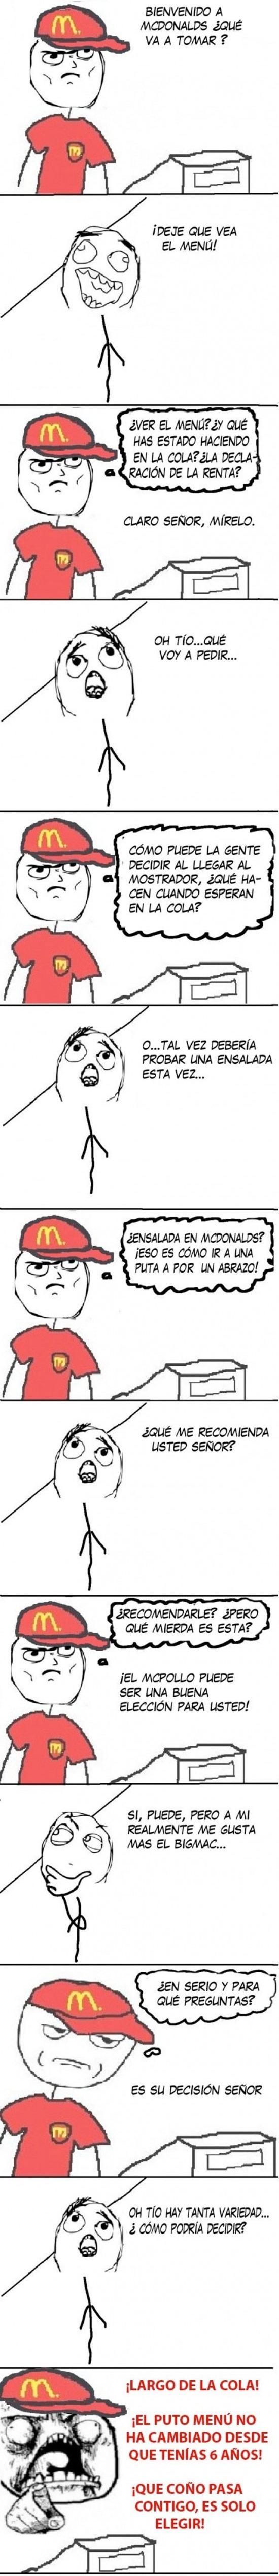 ffffuuuuuuuuuu_los_encargados_del_mc_donalds